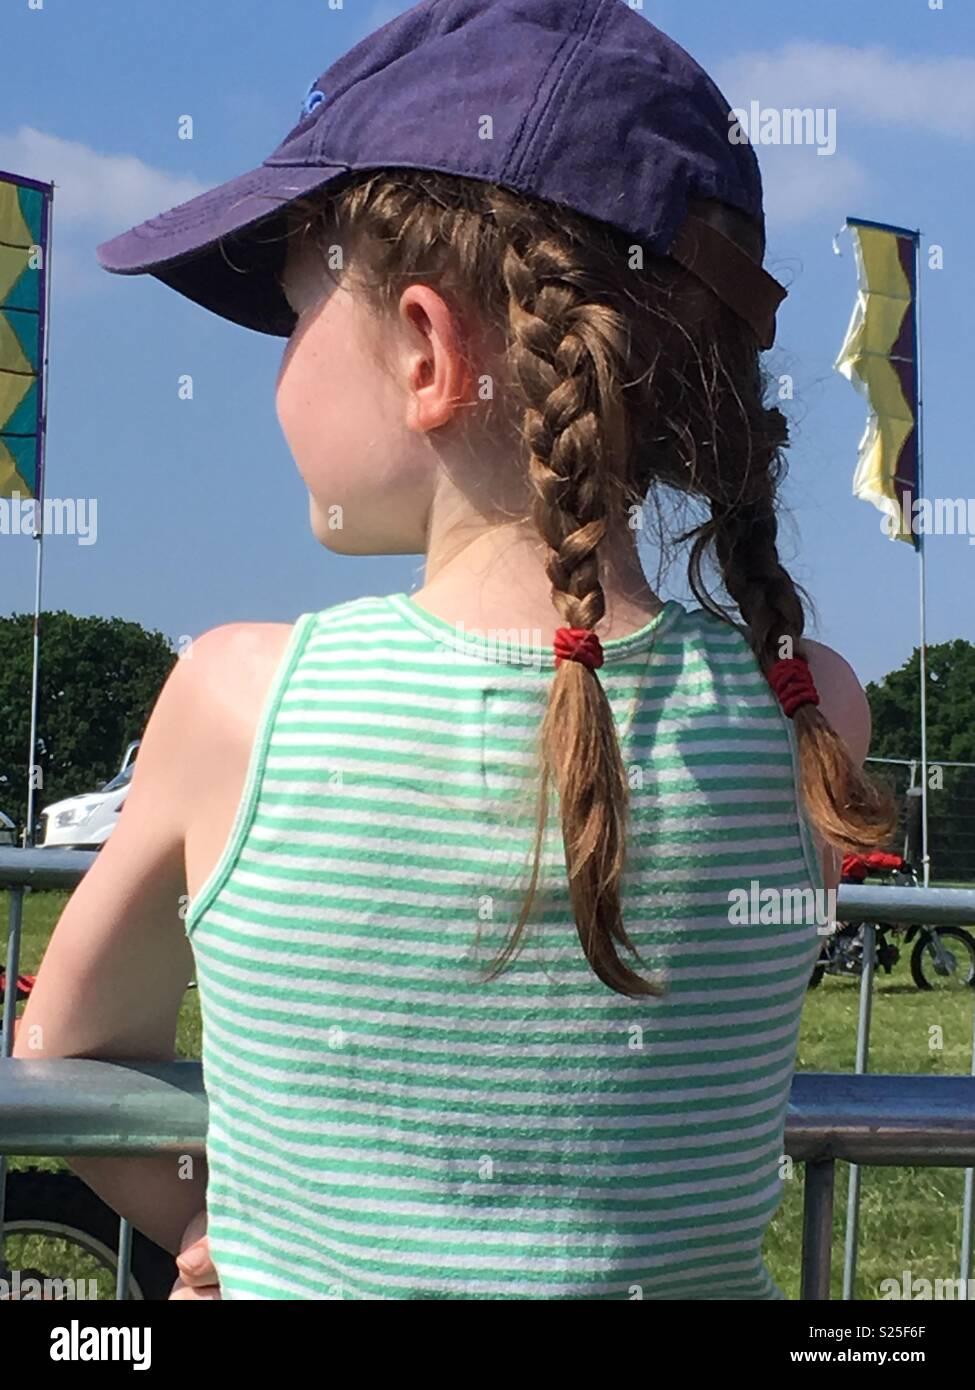 Girl in the festival sun uk - plaits - Stock Image